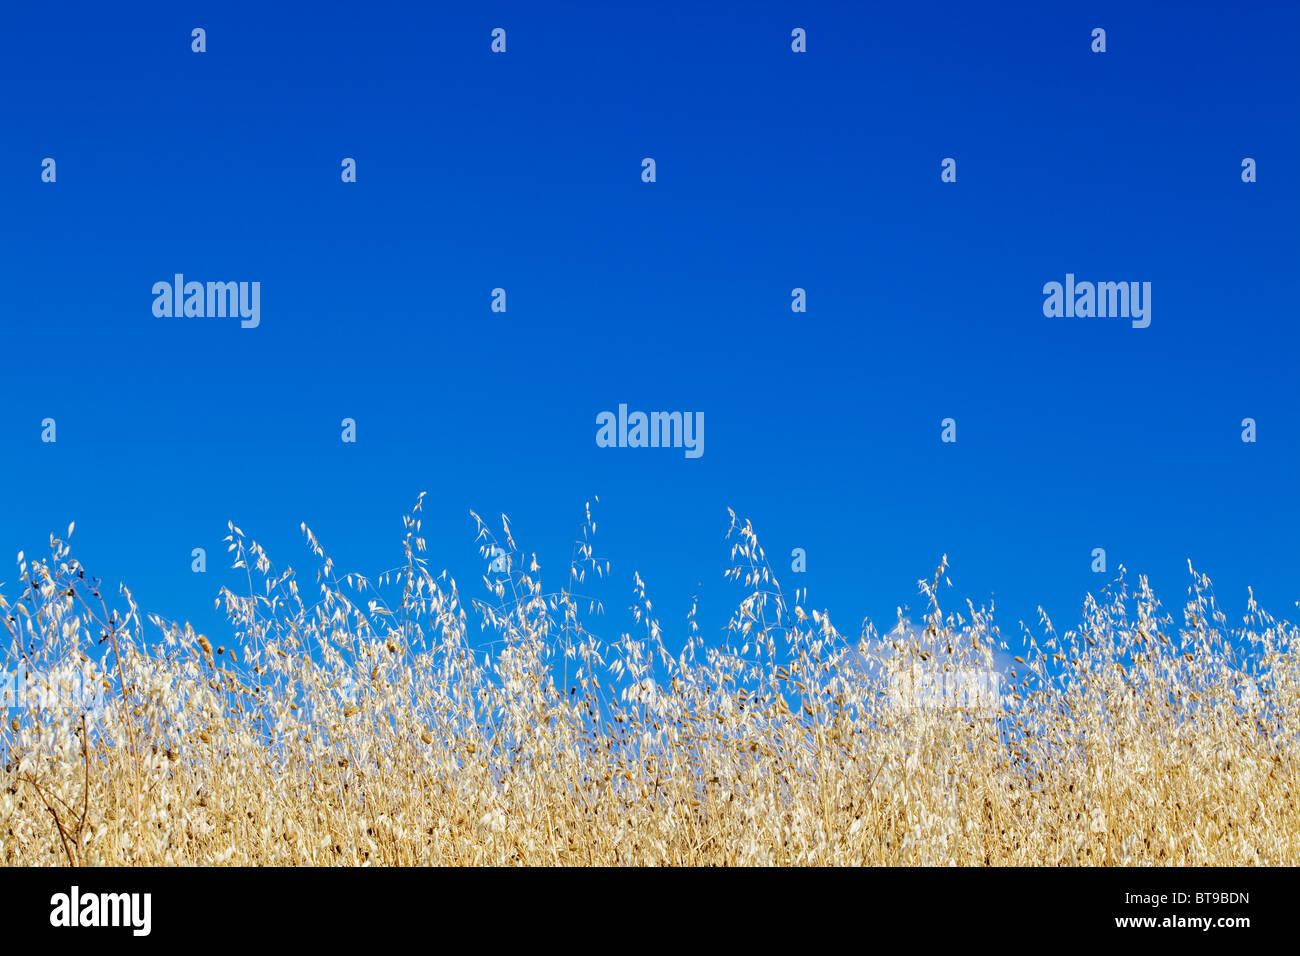 Summer Day - Tuscany, Italy - Stock Image